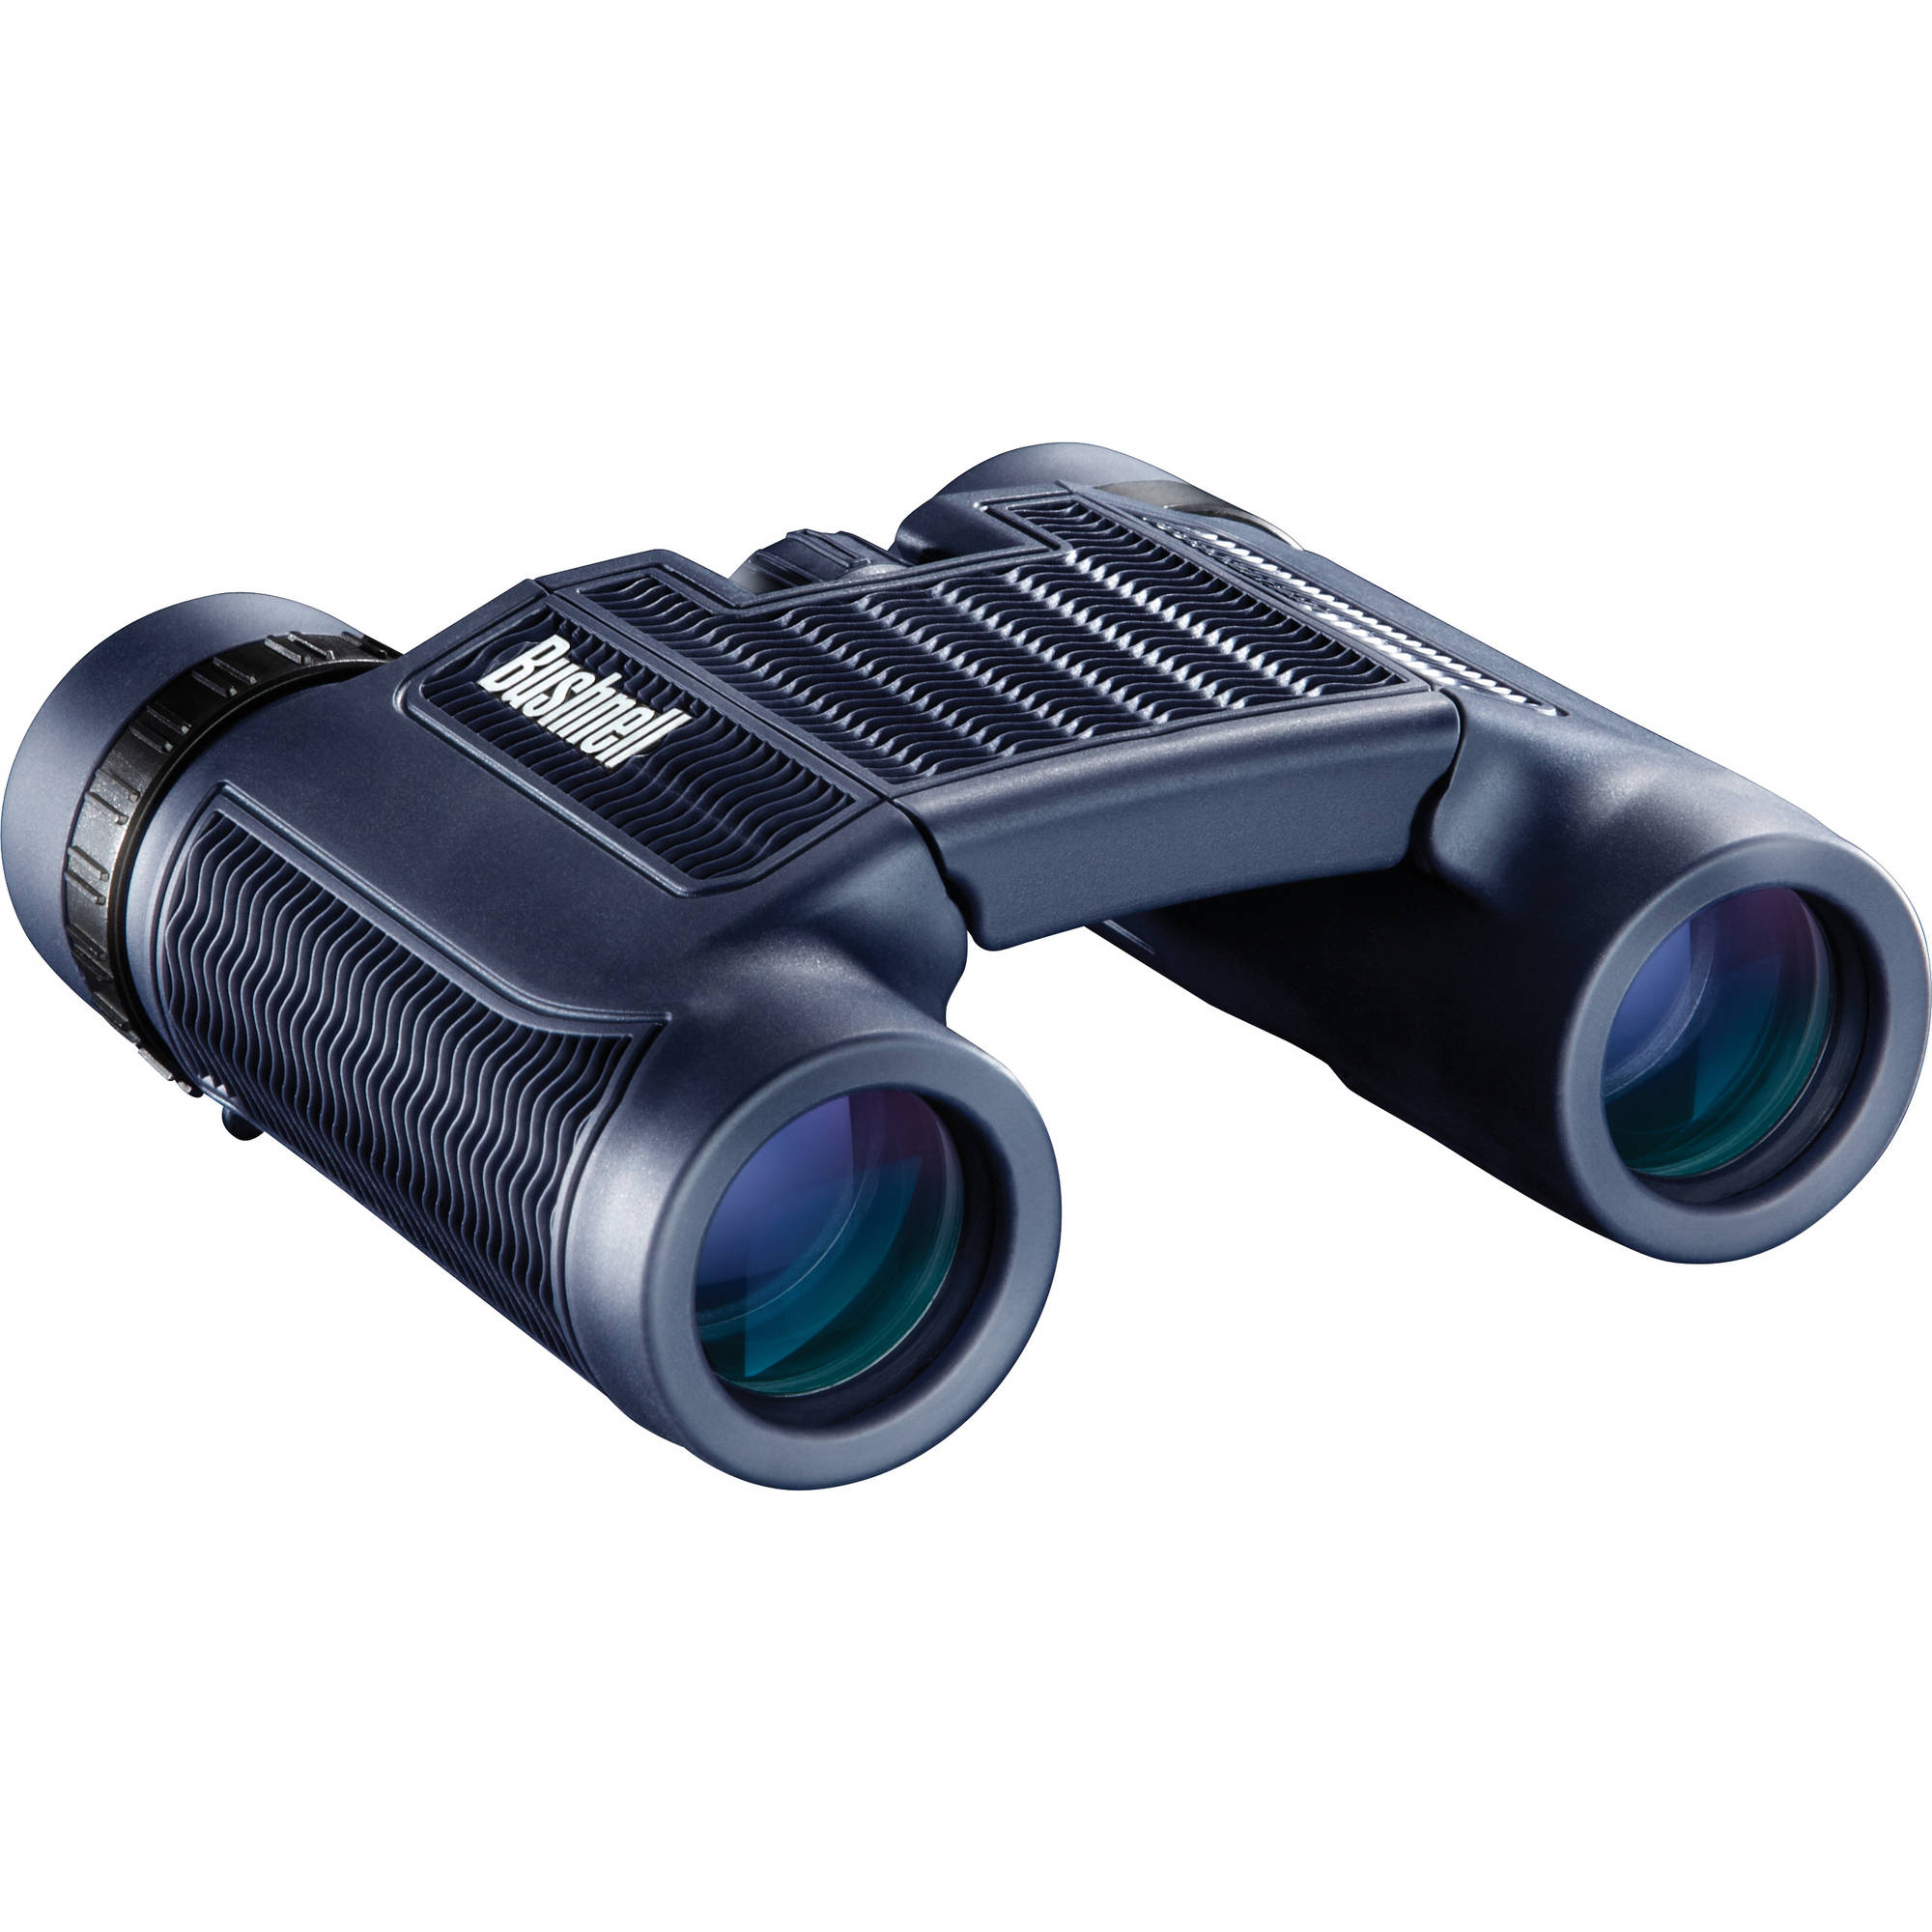 Bushnell H2O Compact Binoculars, Roof Prism